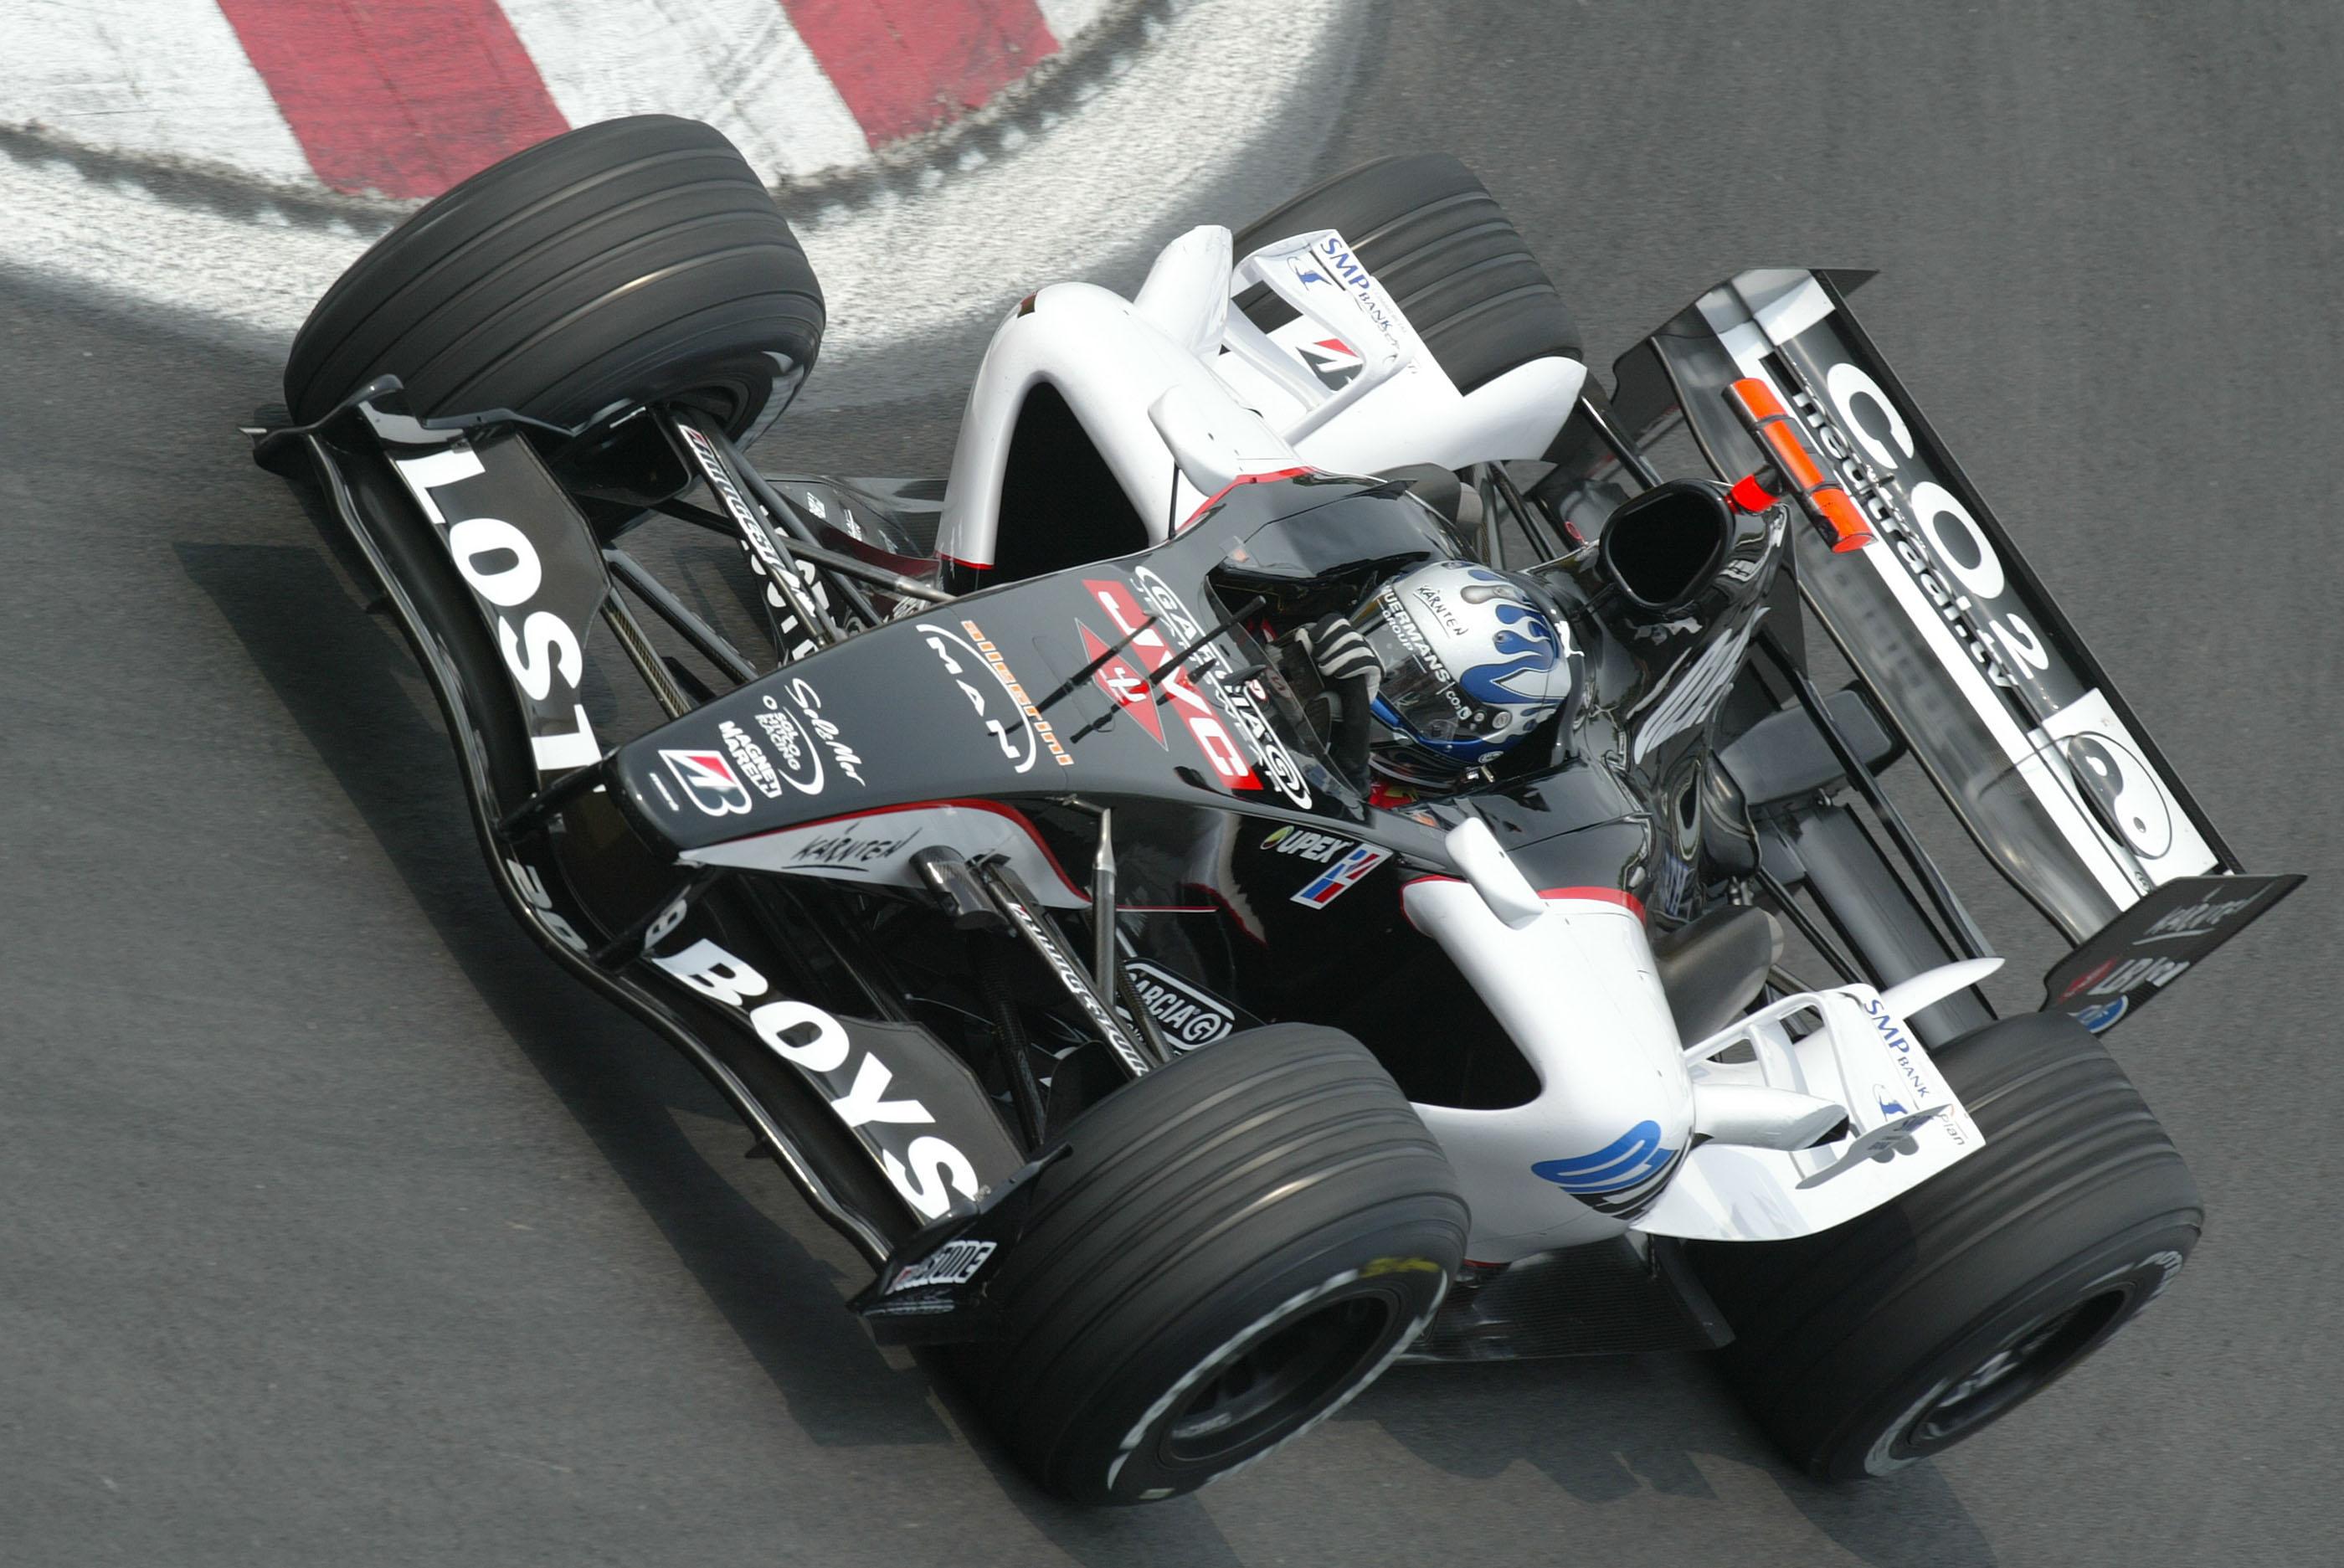 Patrick Friesacher Minardi F1 2005